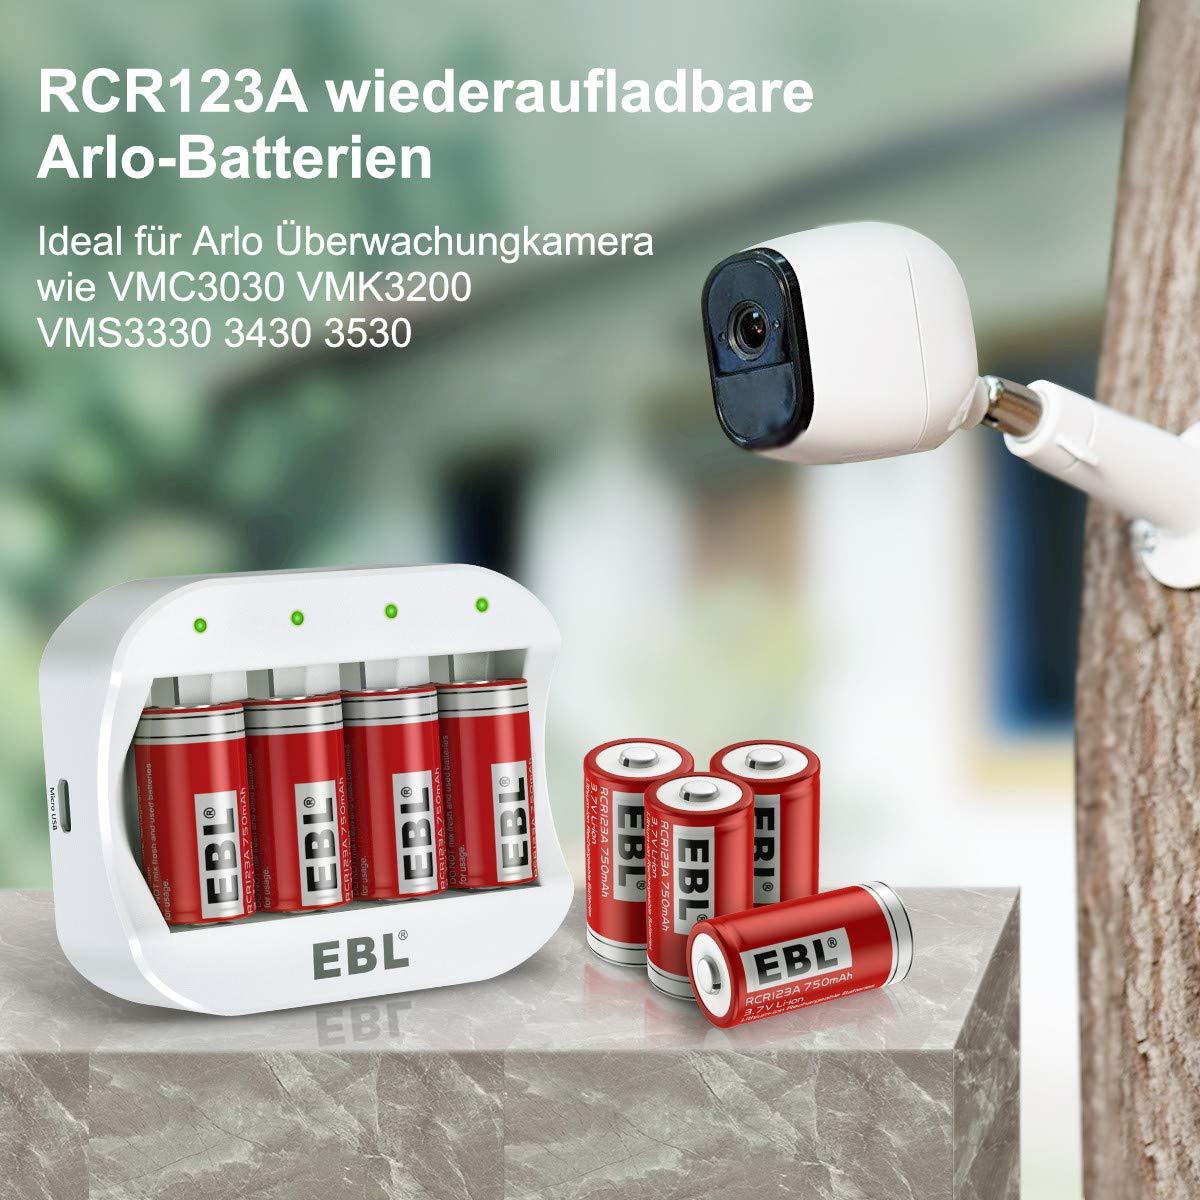 EBL RCR123A Ladegerät mit RCR123A Akku für Arlo Kamera 3.7V wiederaufladbare Li-Ionen Batterien 8 Stück (VMC3030/VMK3200/VMS3330/3430/3530)